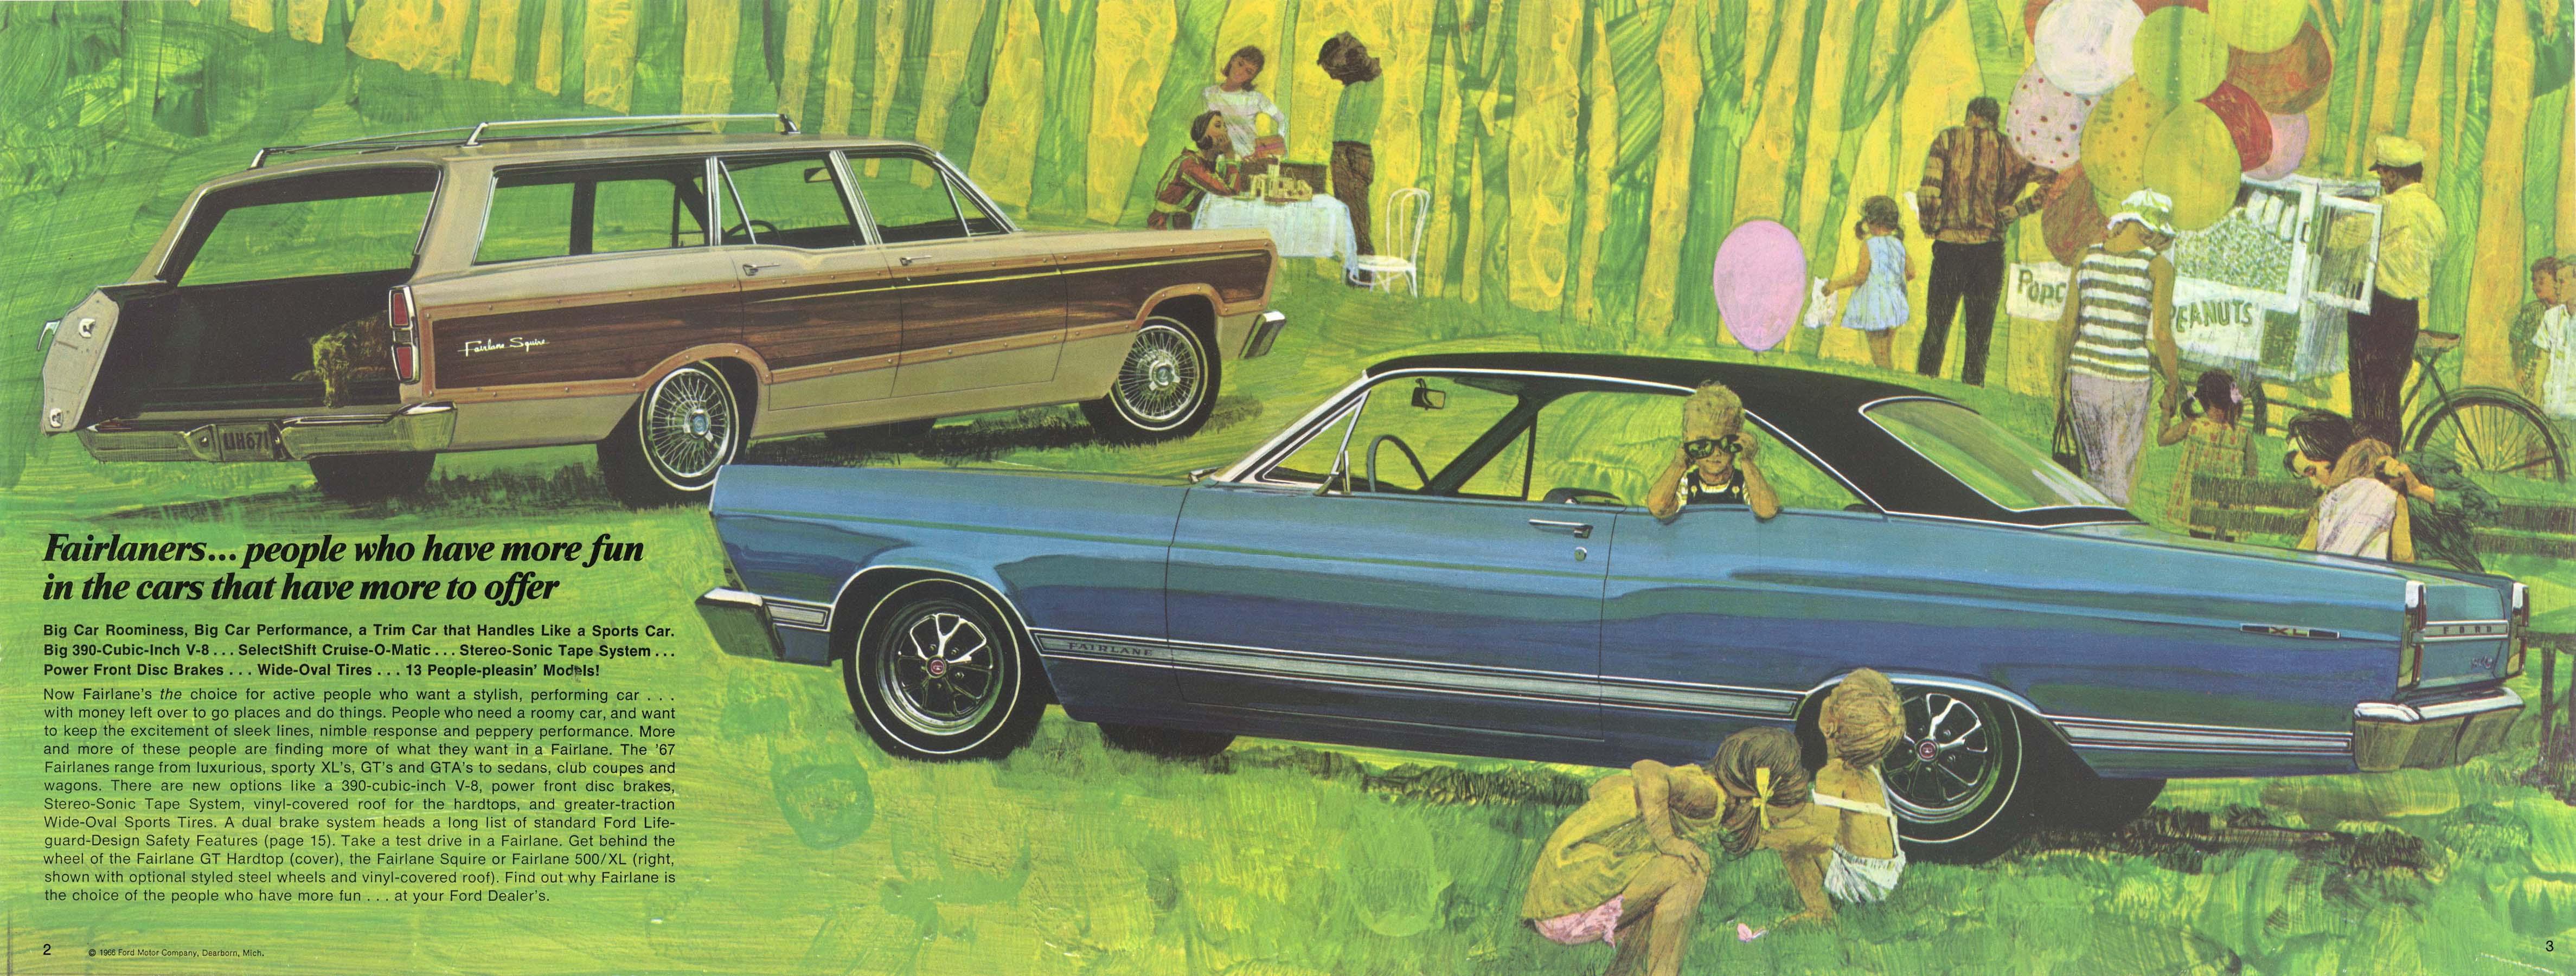 1967 Ford Fairlane Brochure